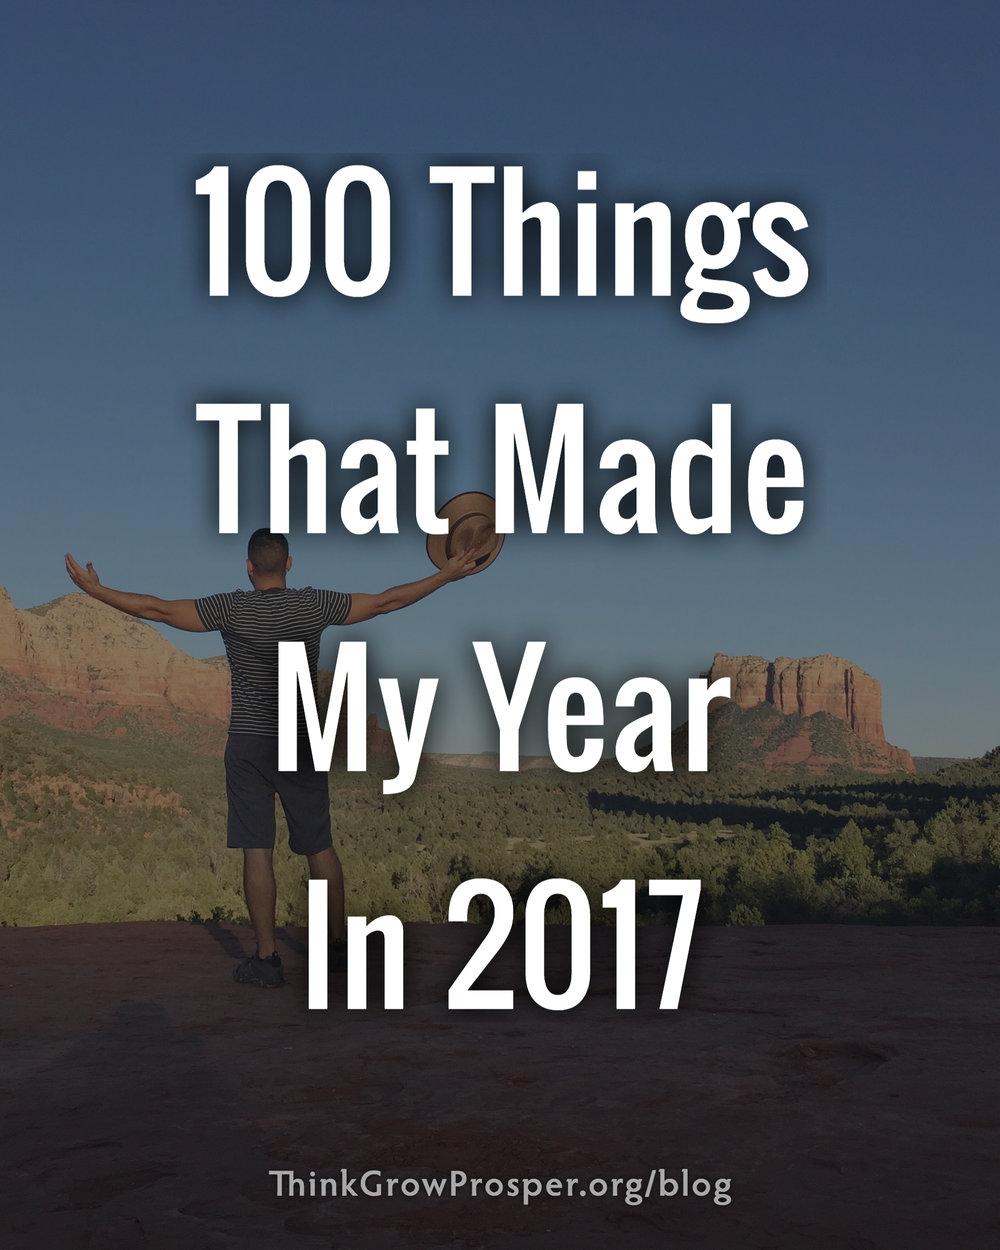 100ThingsThatMadeMyYear2017.jpeg